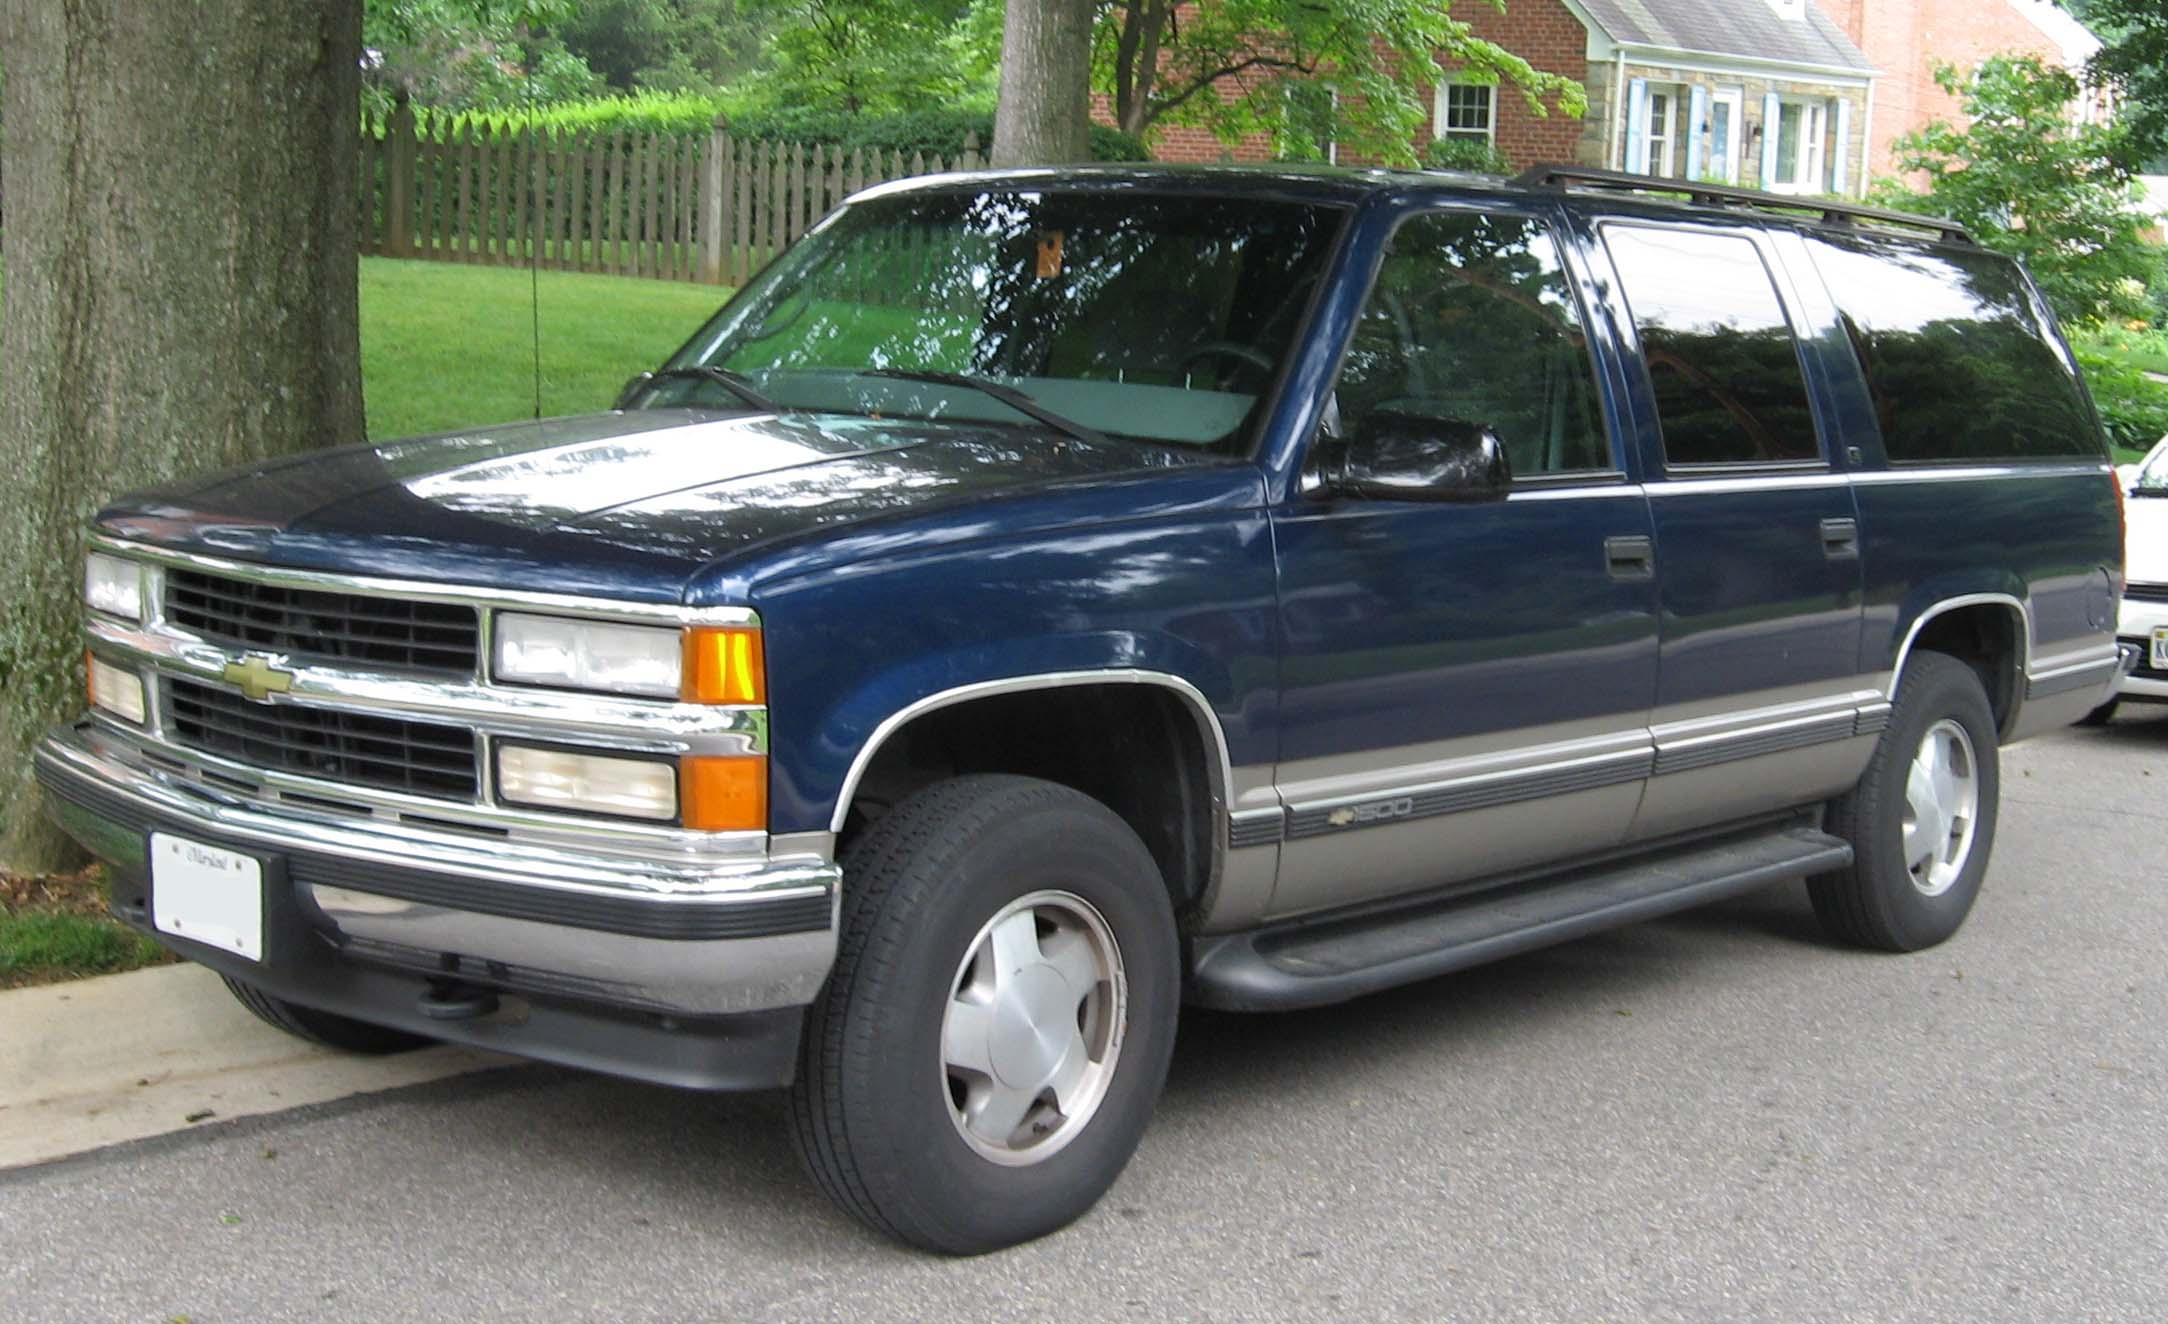 Chevrolet Suburban 2008 foto - 1